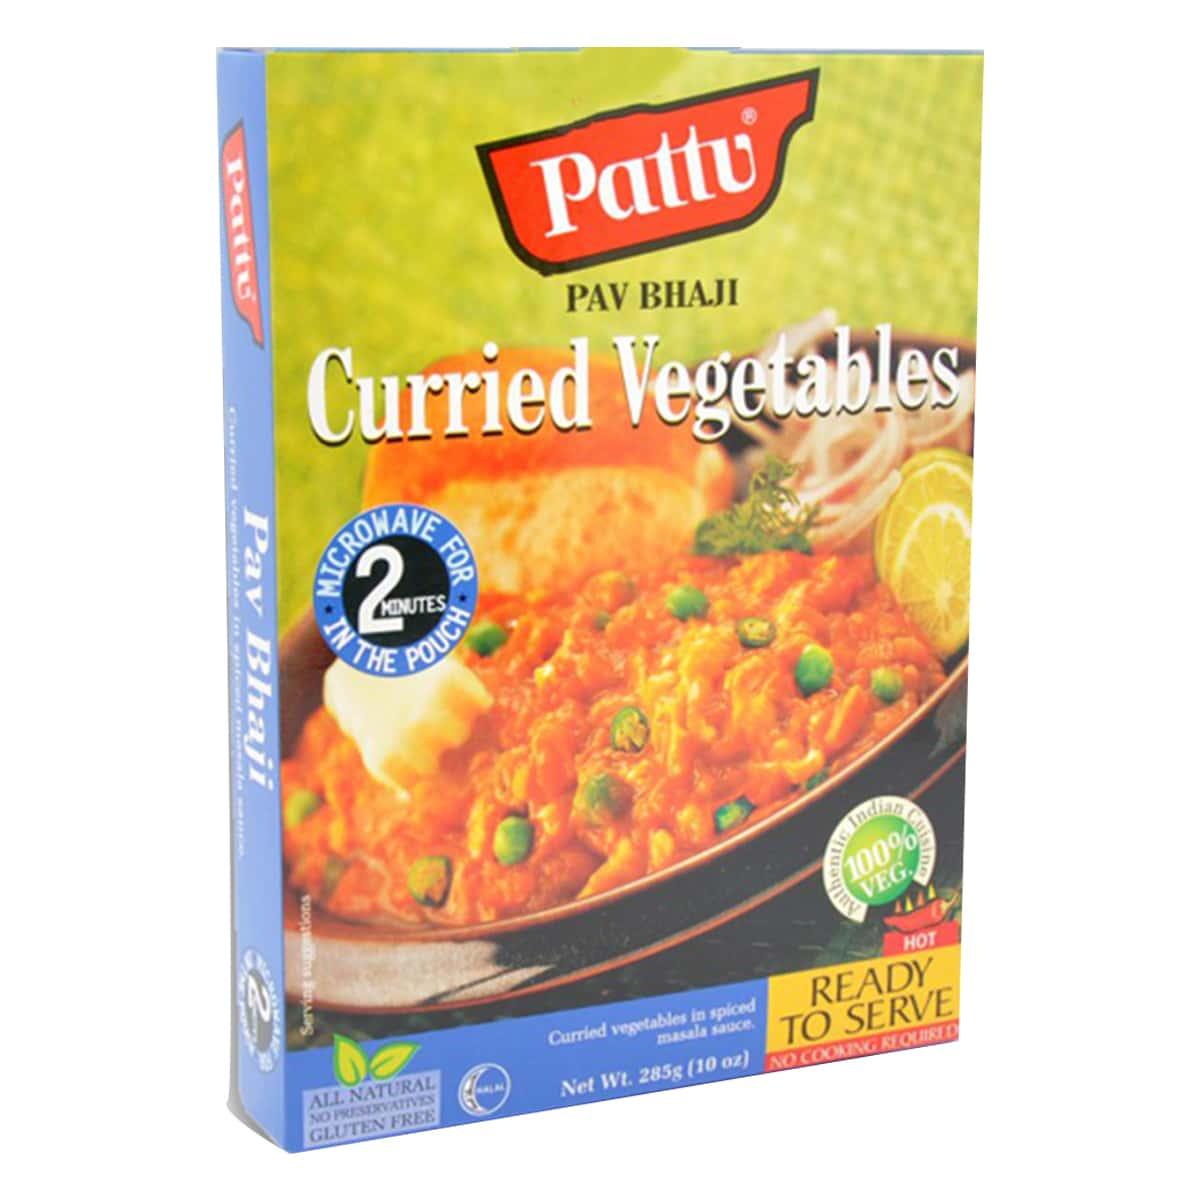 Buy Pattu Pav Bhaji (Curried Vegetables) Ready to Serve - 285 gm